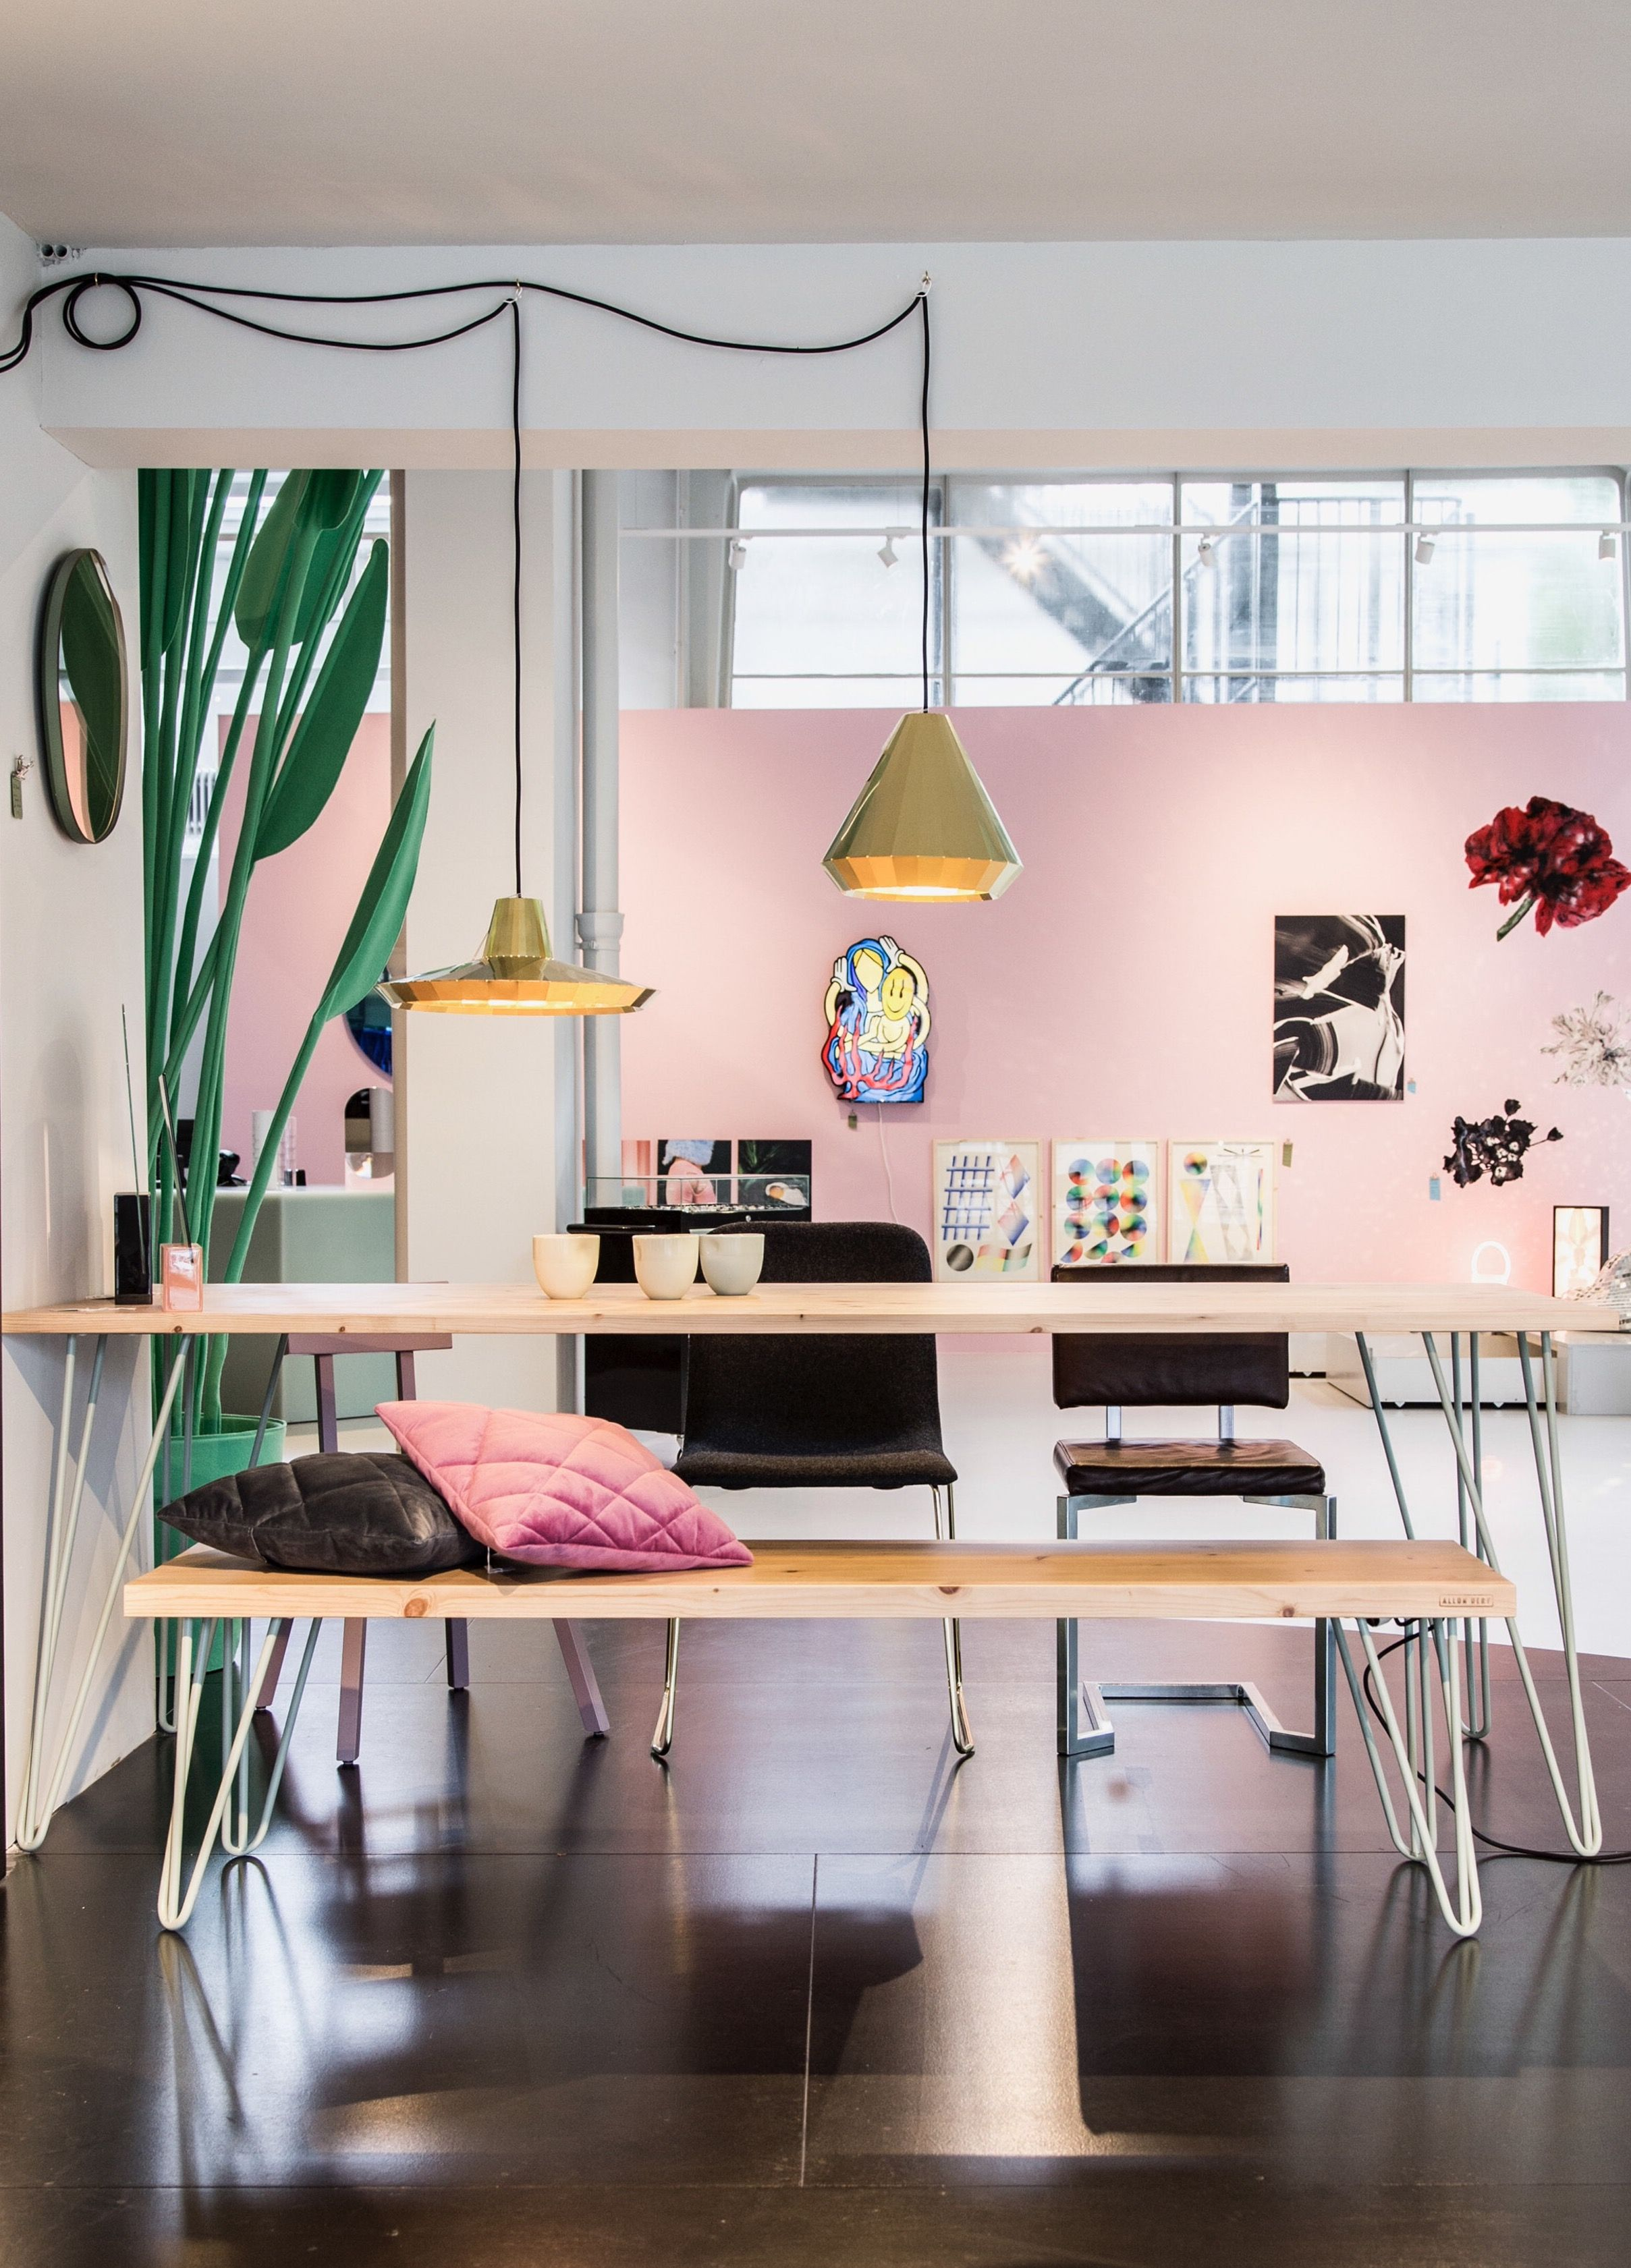 Eettafel | Pinterest - Tafel bankje, Eettafel en Eetkamer